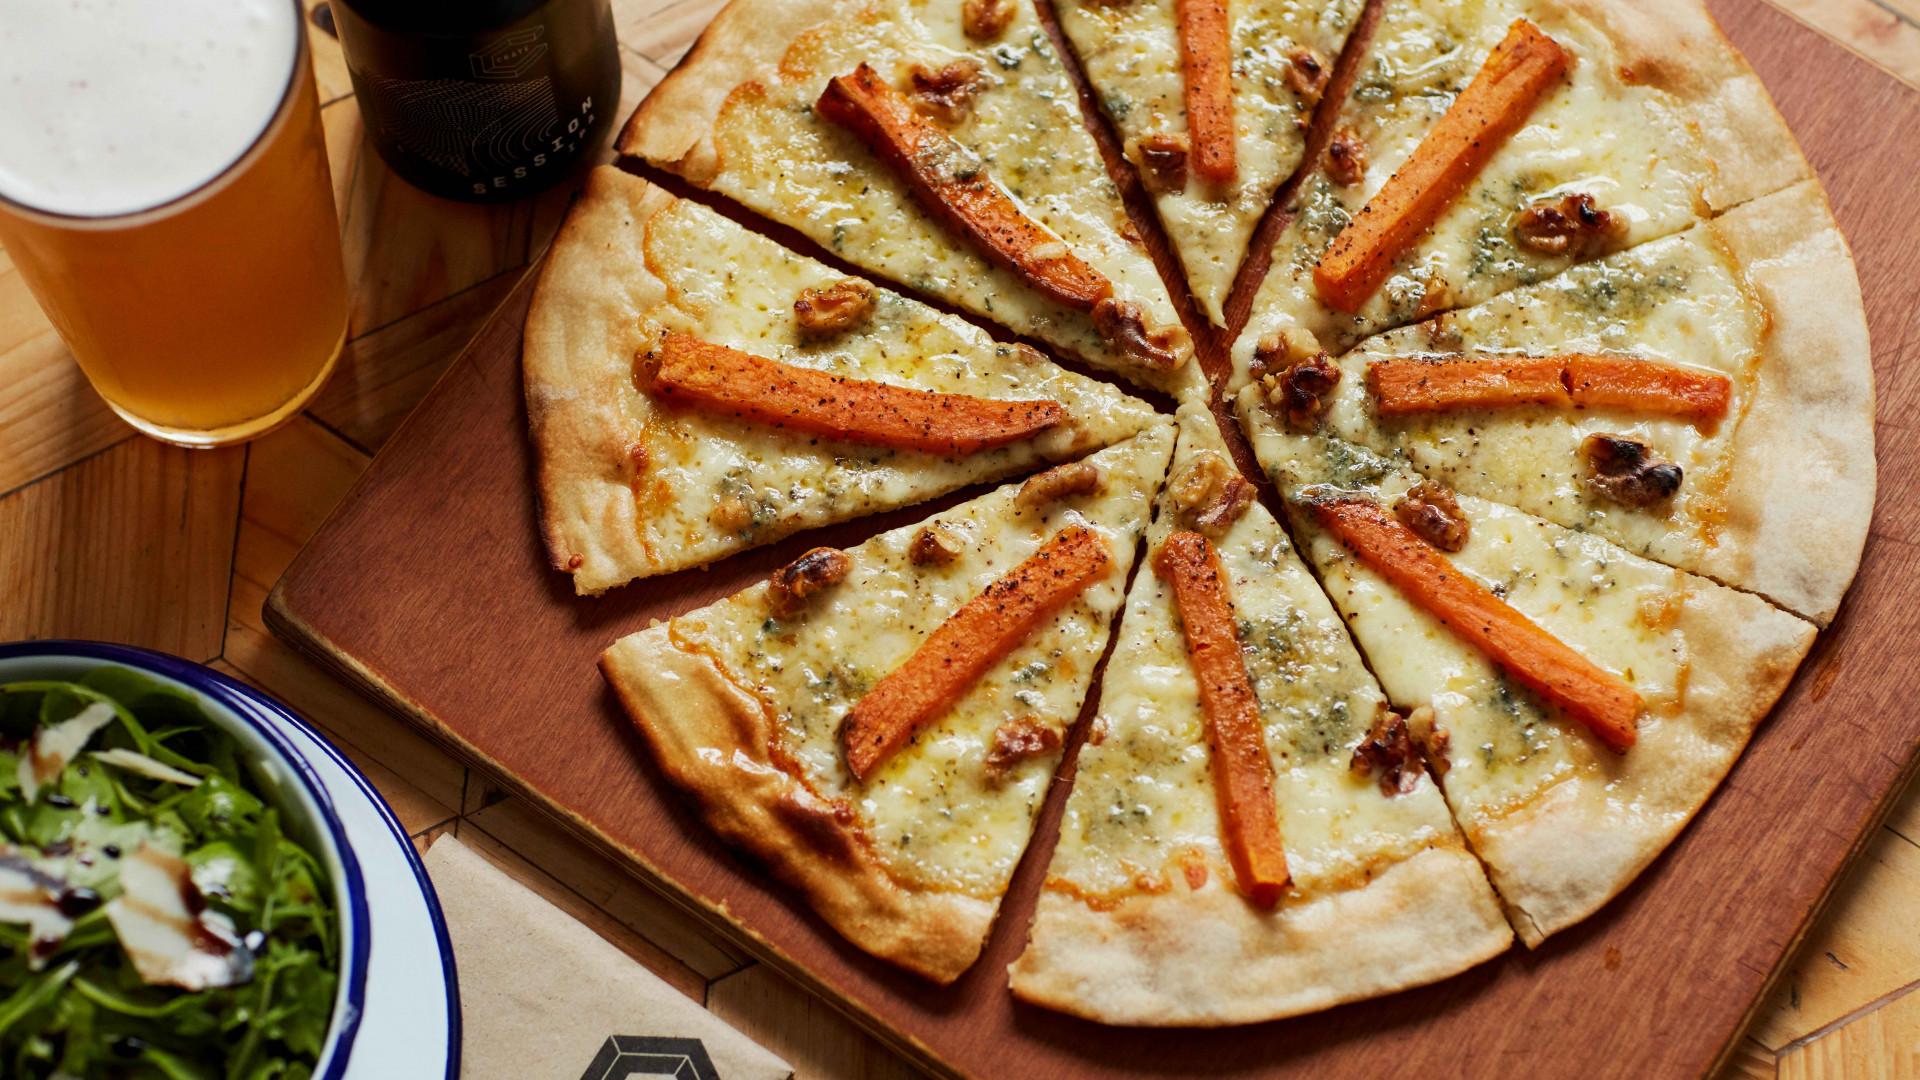 Crate's sweet potato, stilton and walnuts pizza